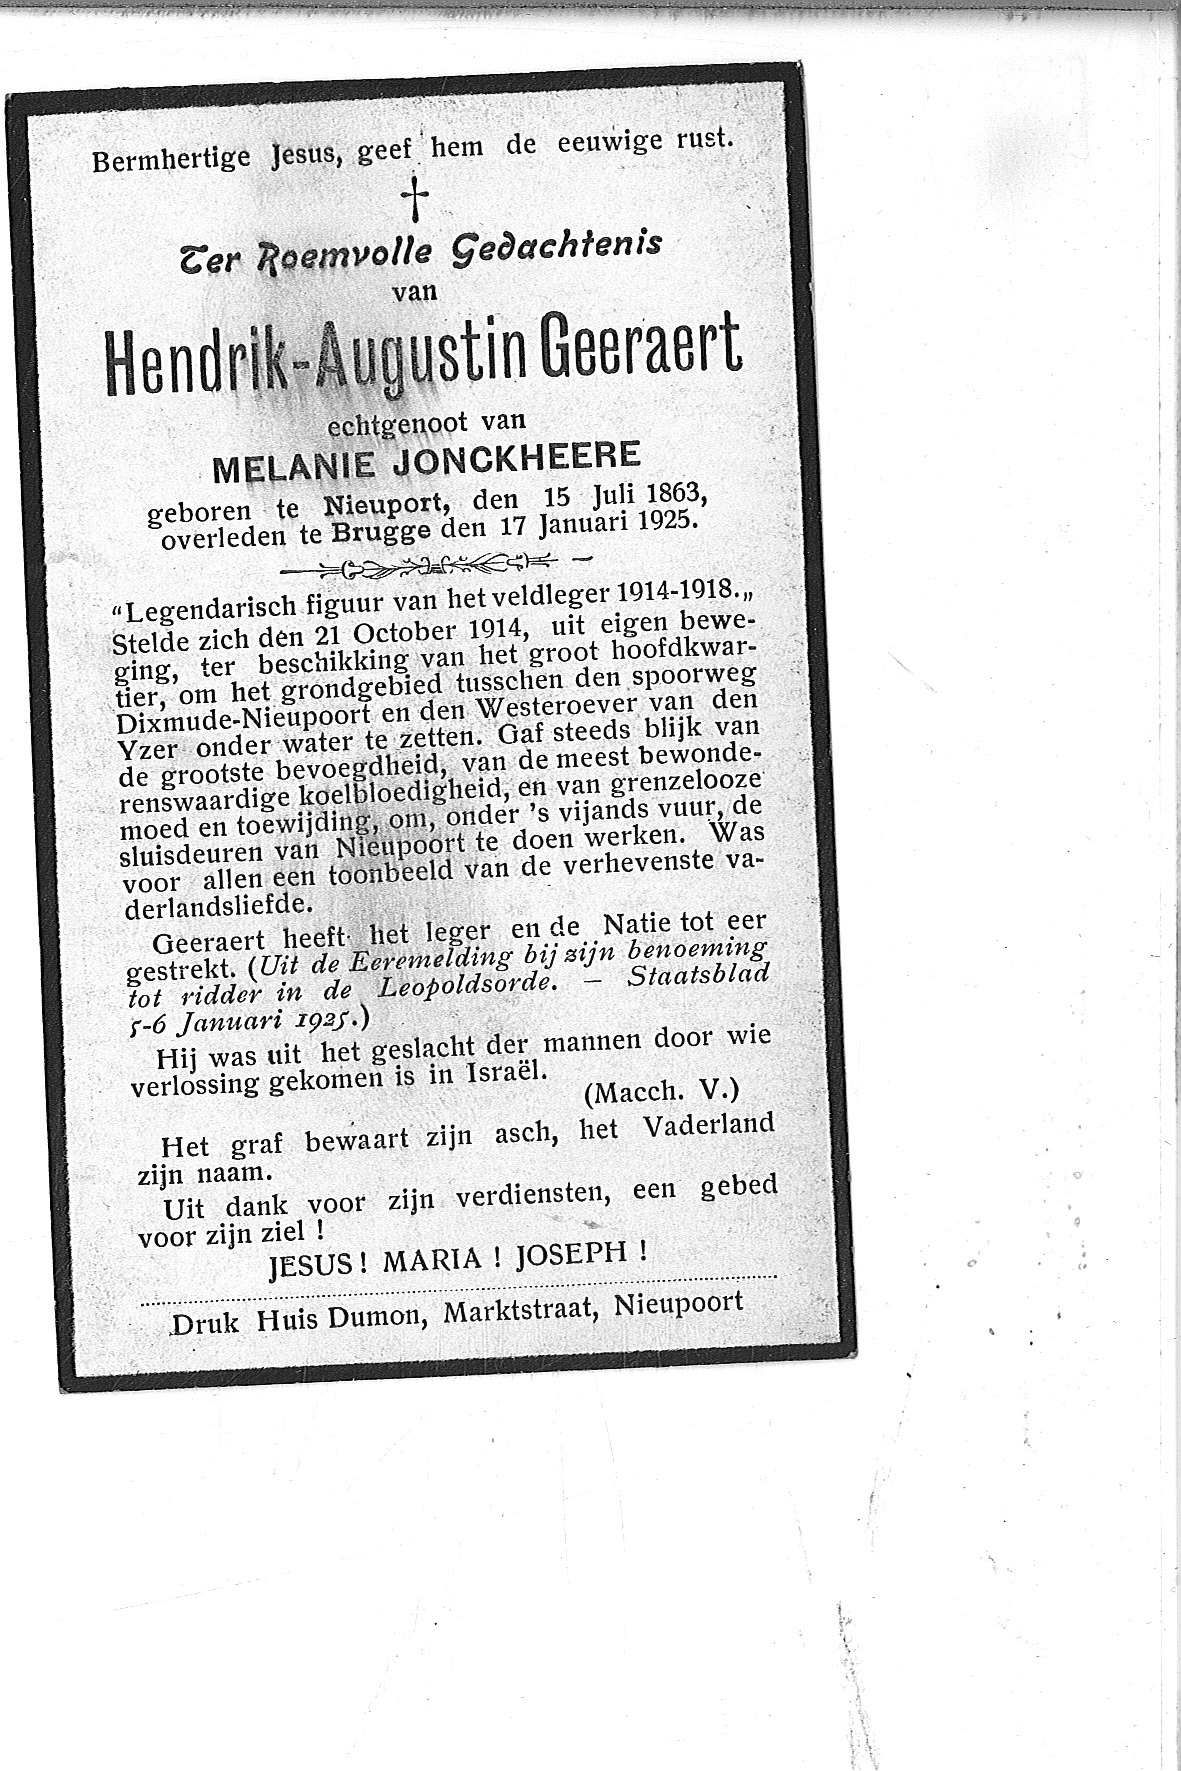 Hendrik-Augustin(1925)20130604133153_00029.jpg